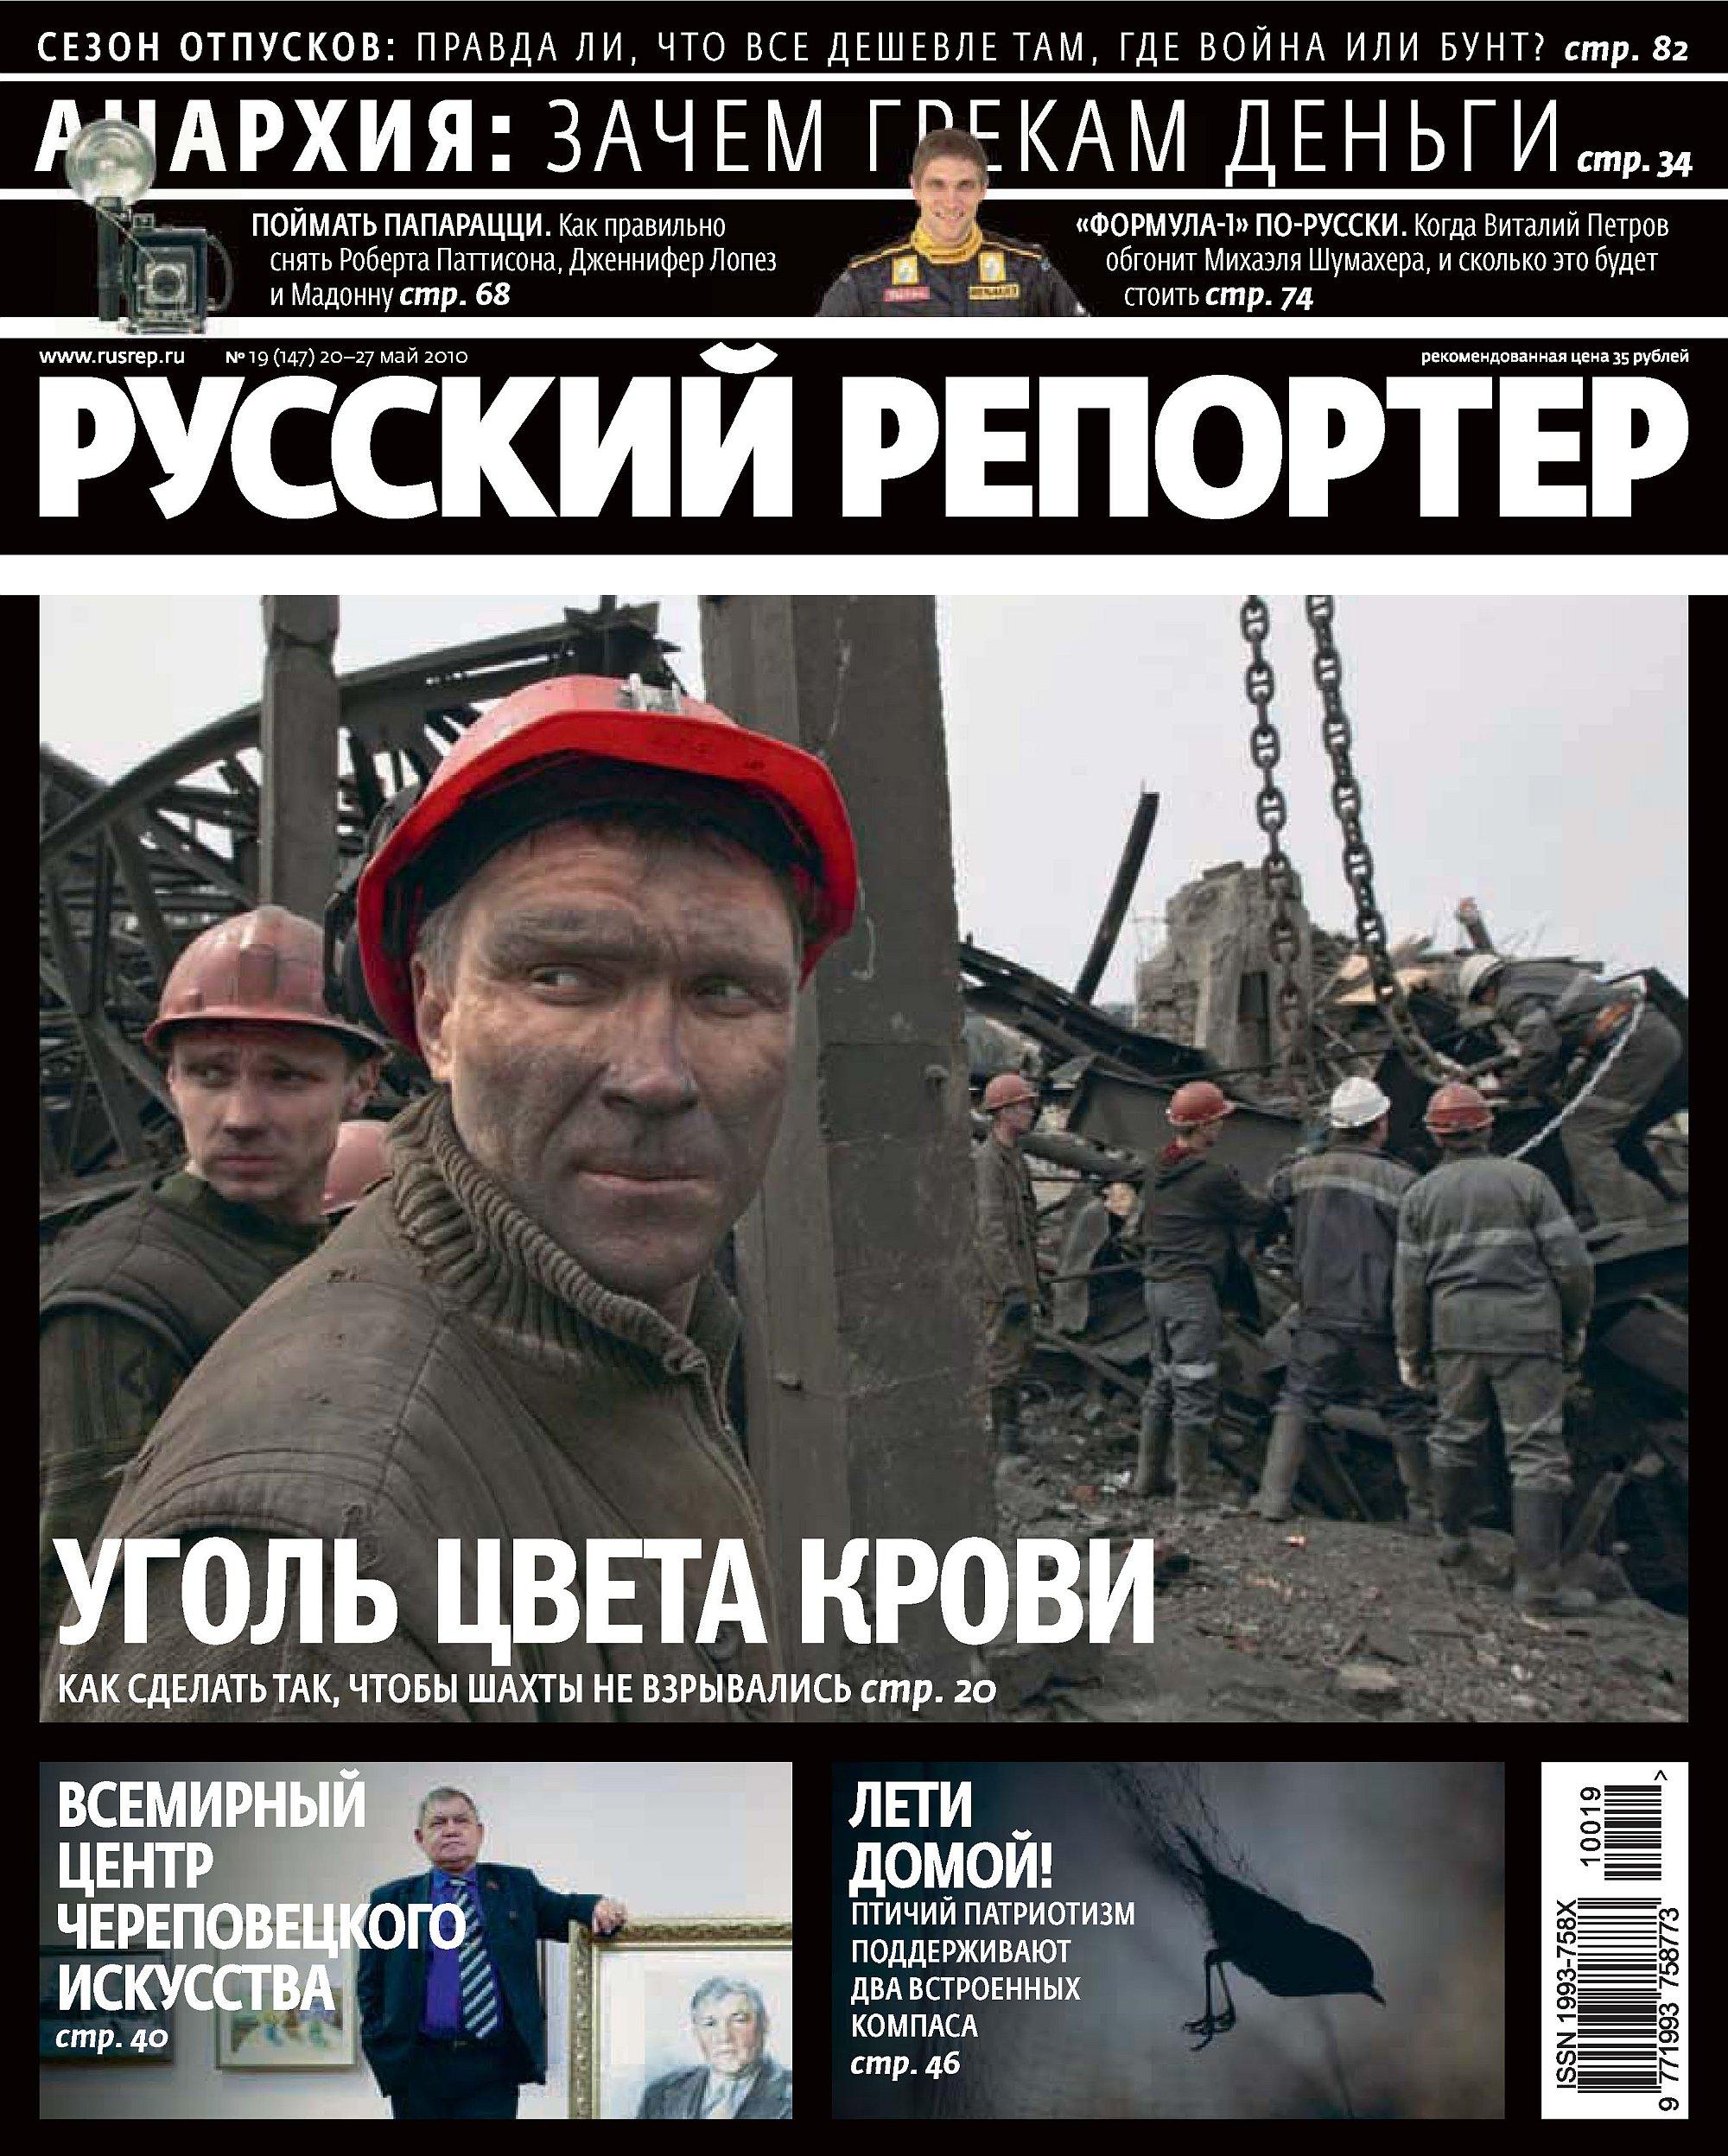 Русский Репортер № 19/2010